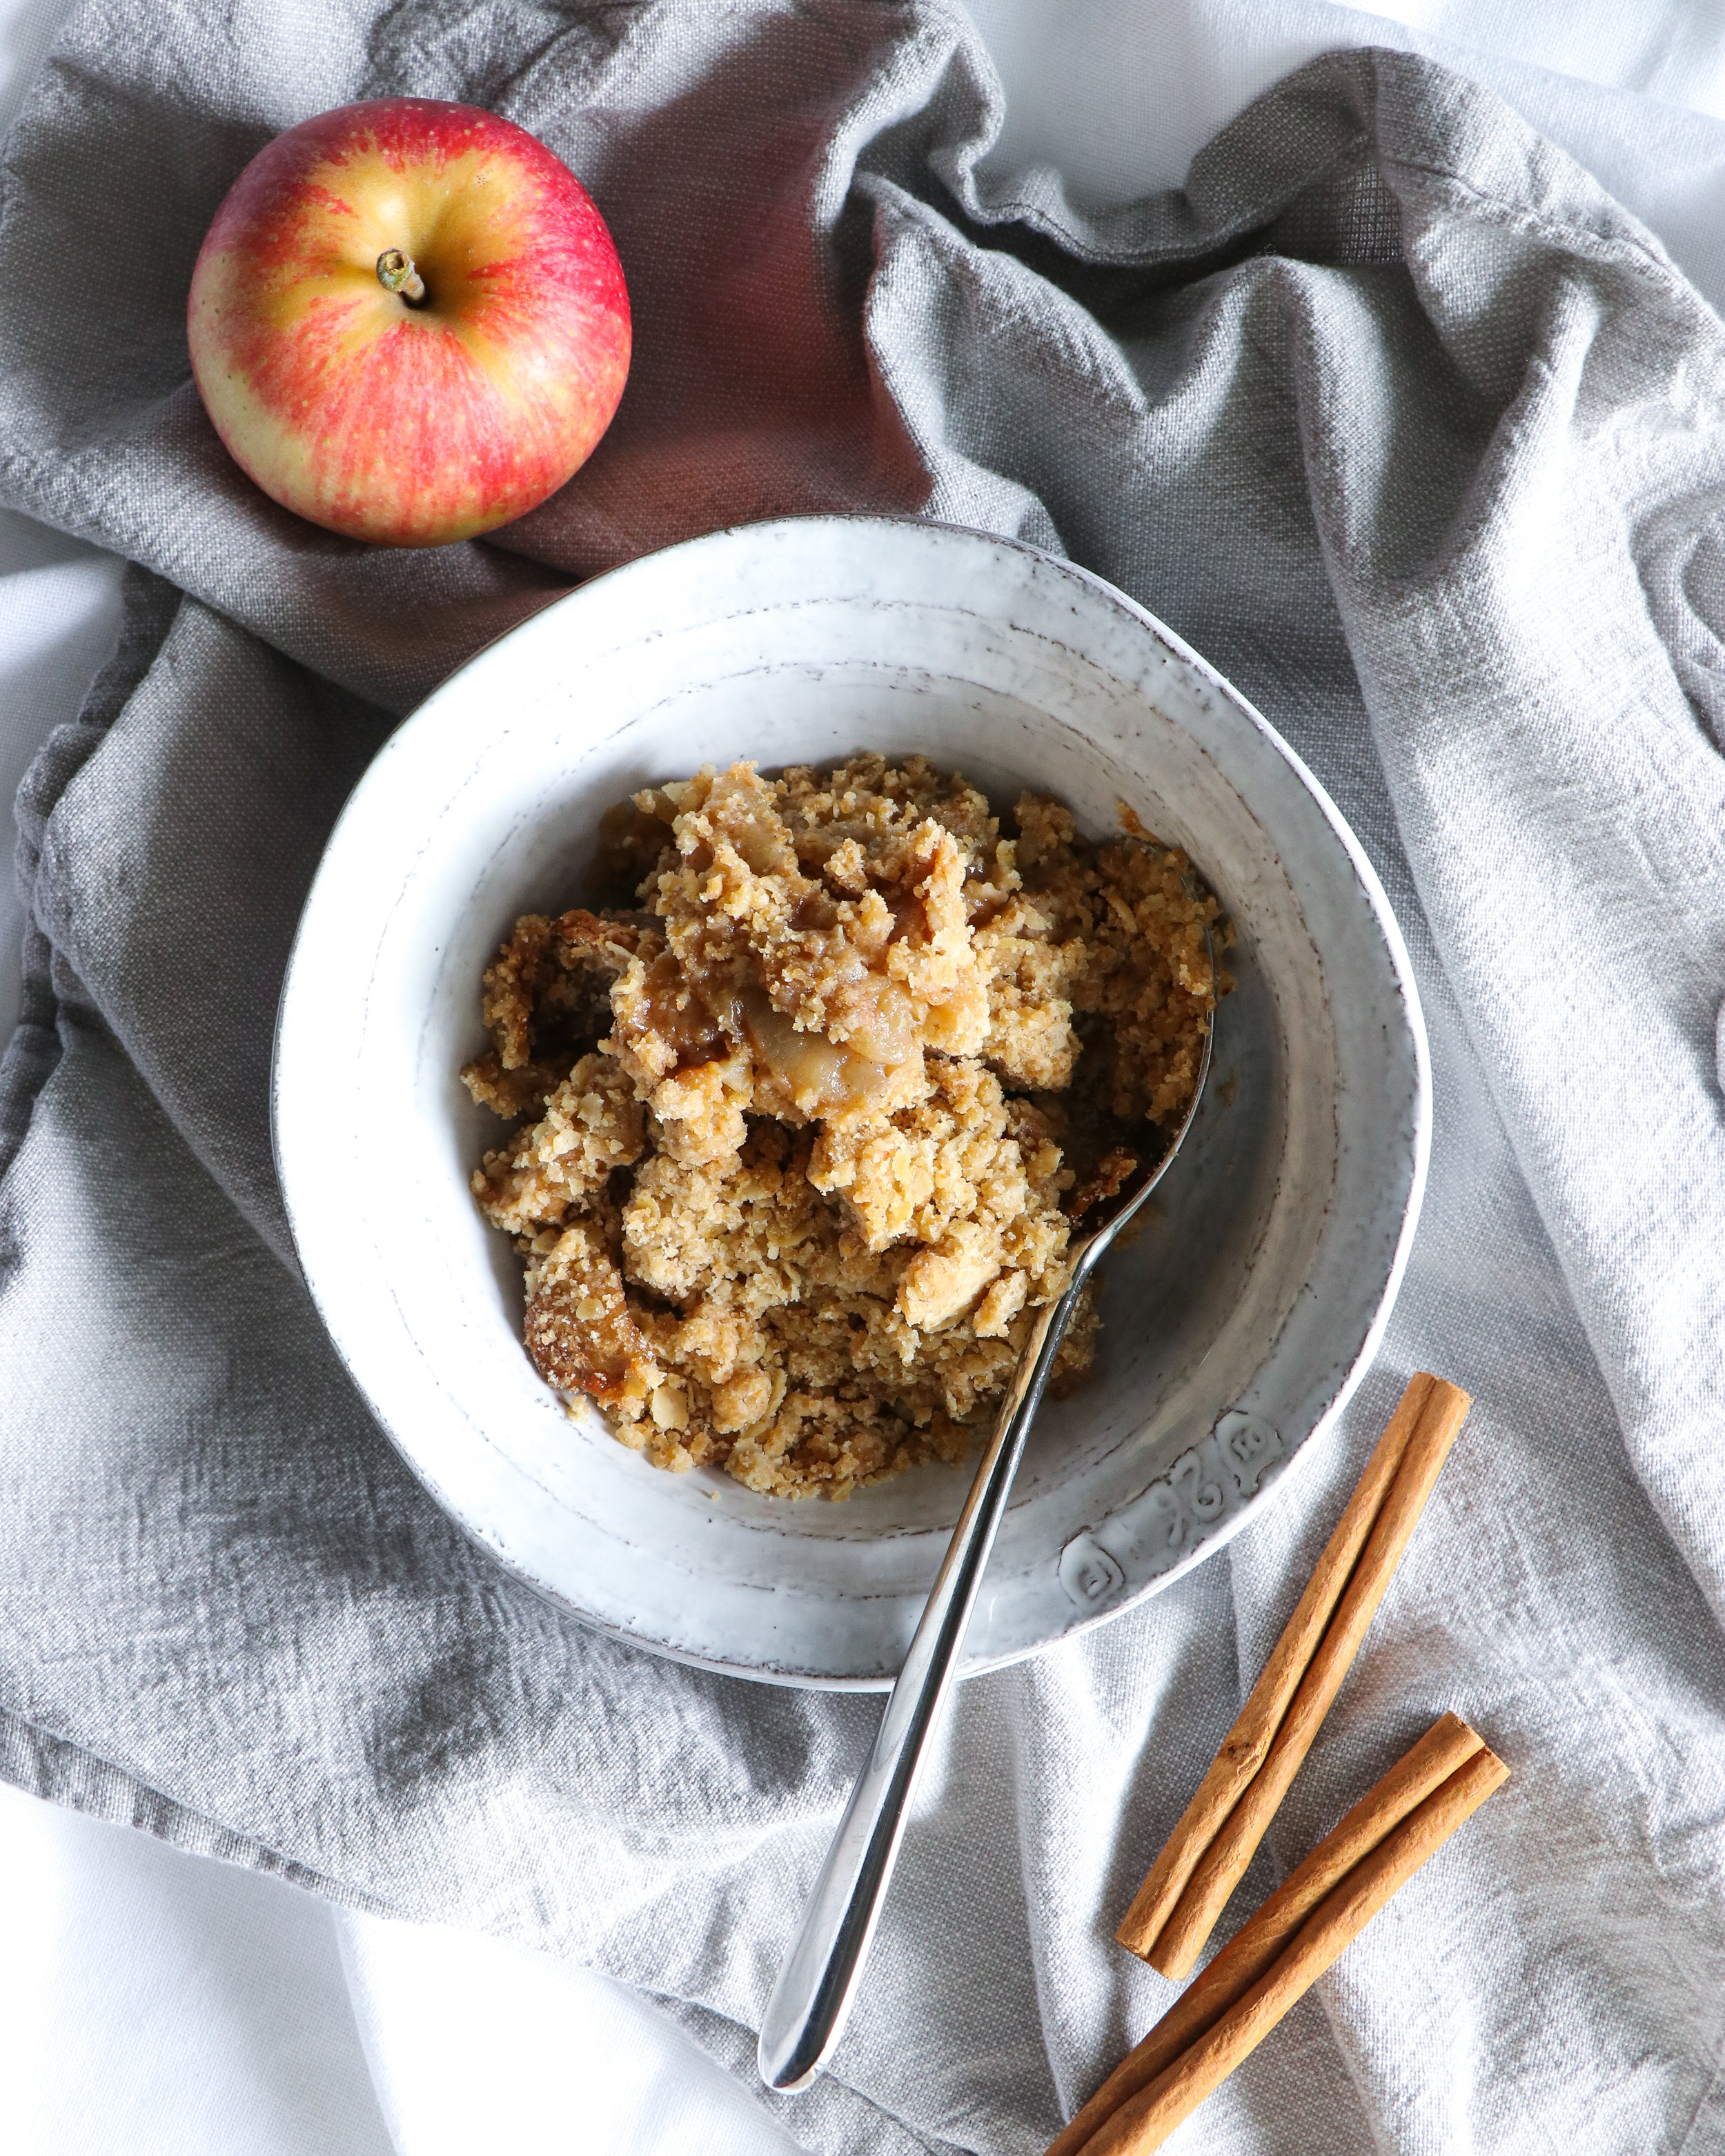 dairy and egg free vegan apple crumble recipe